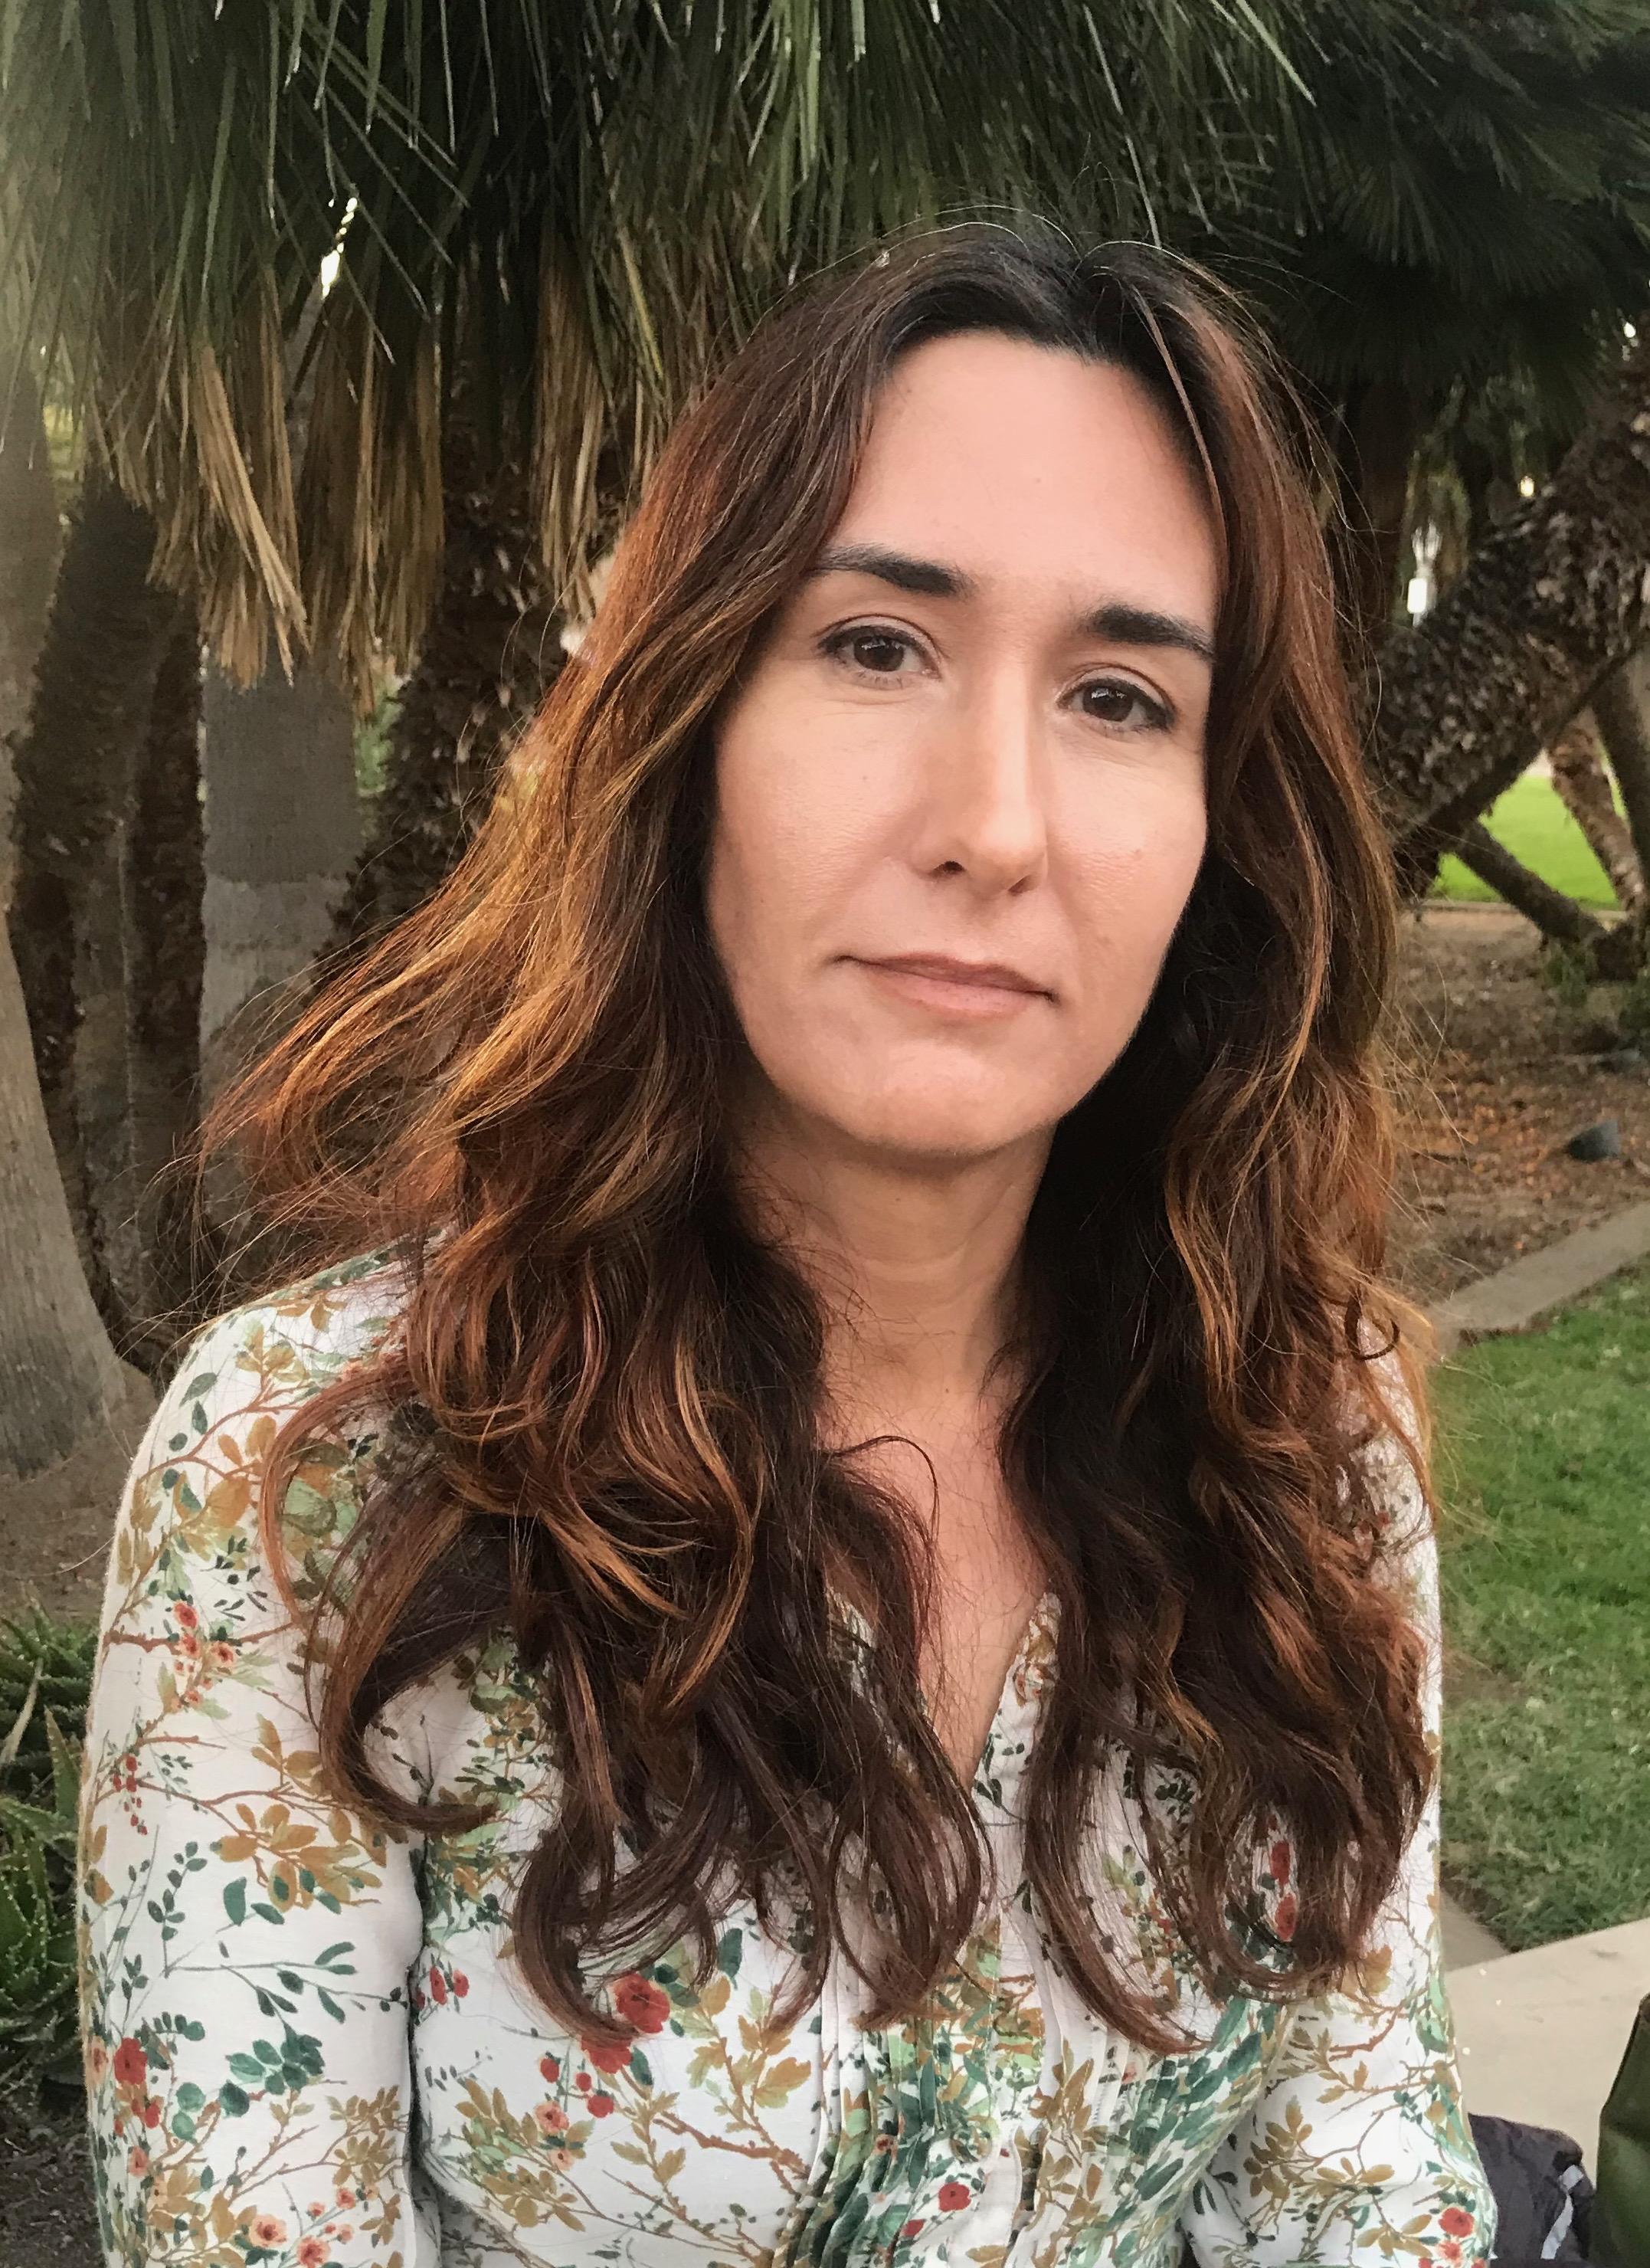 Sonia Martinez Diaz